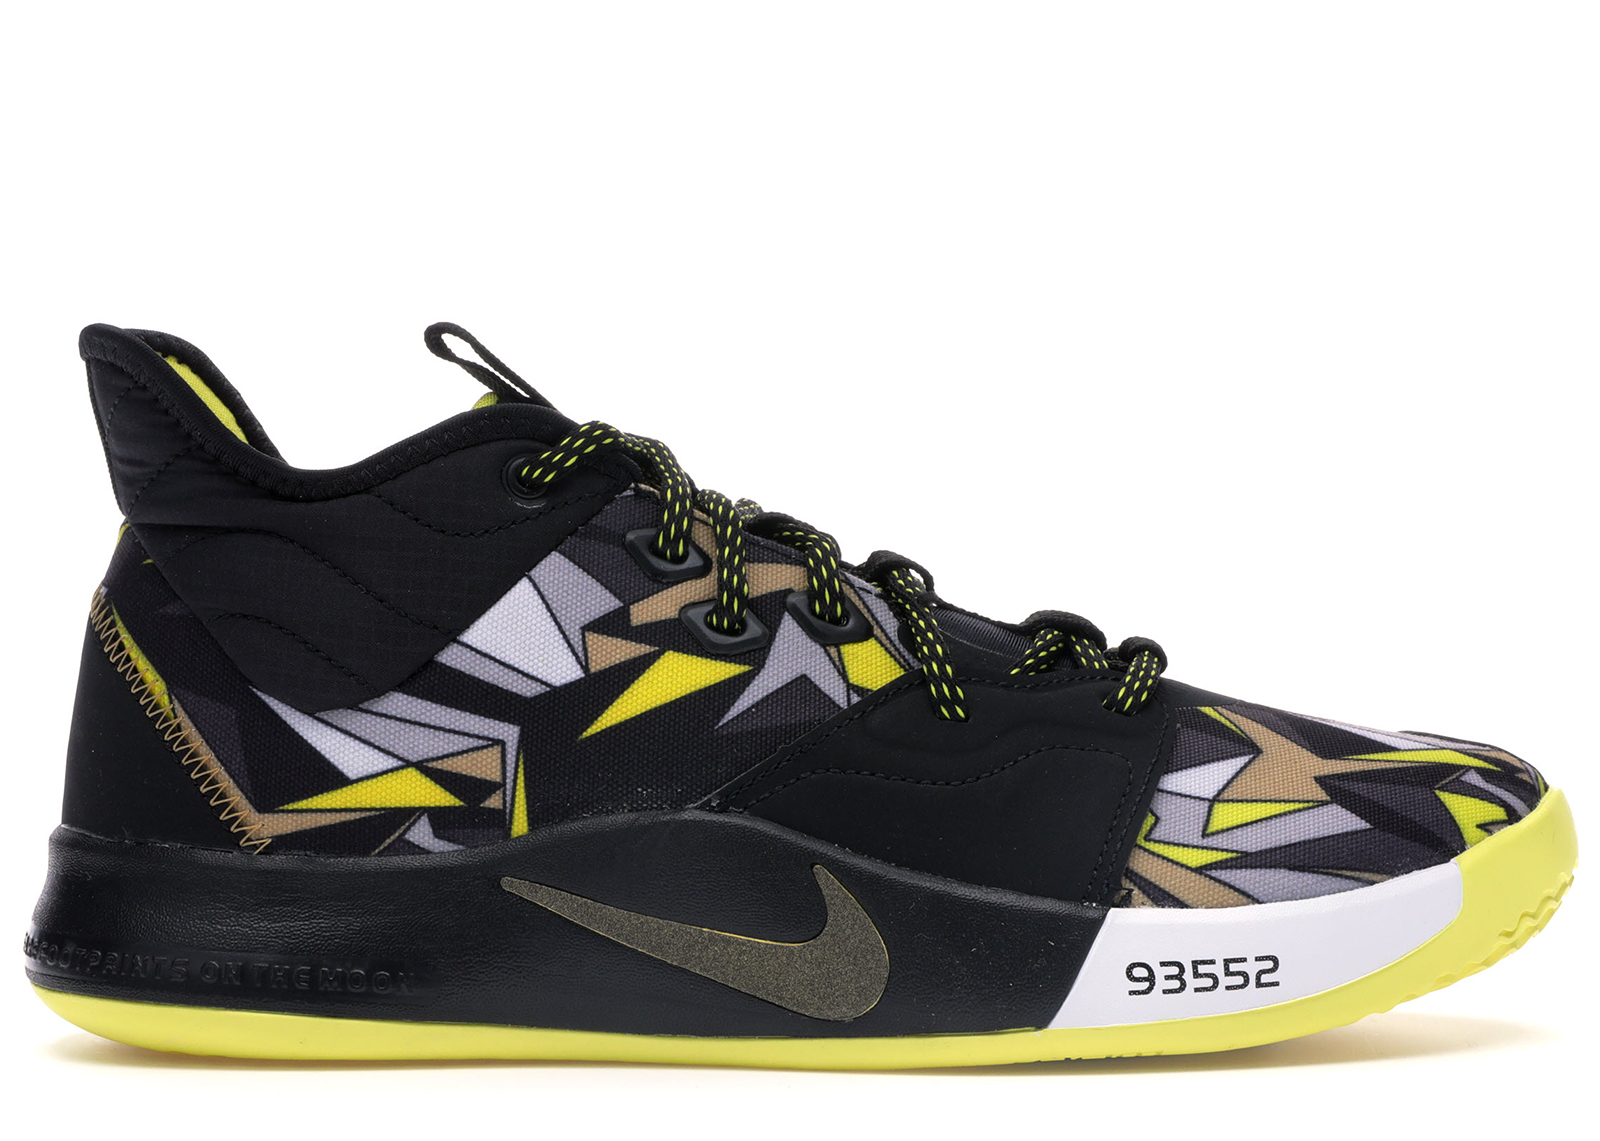 Nike PG 3 Mamba Mentality - AO2607-900